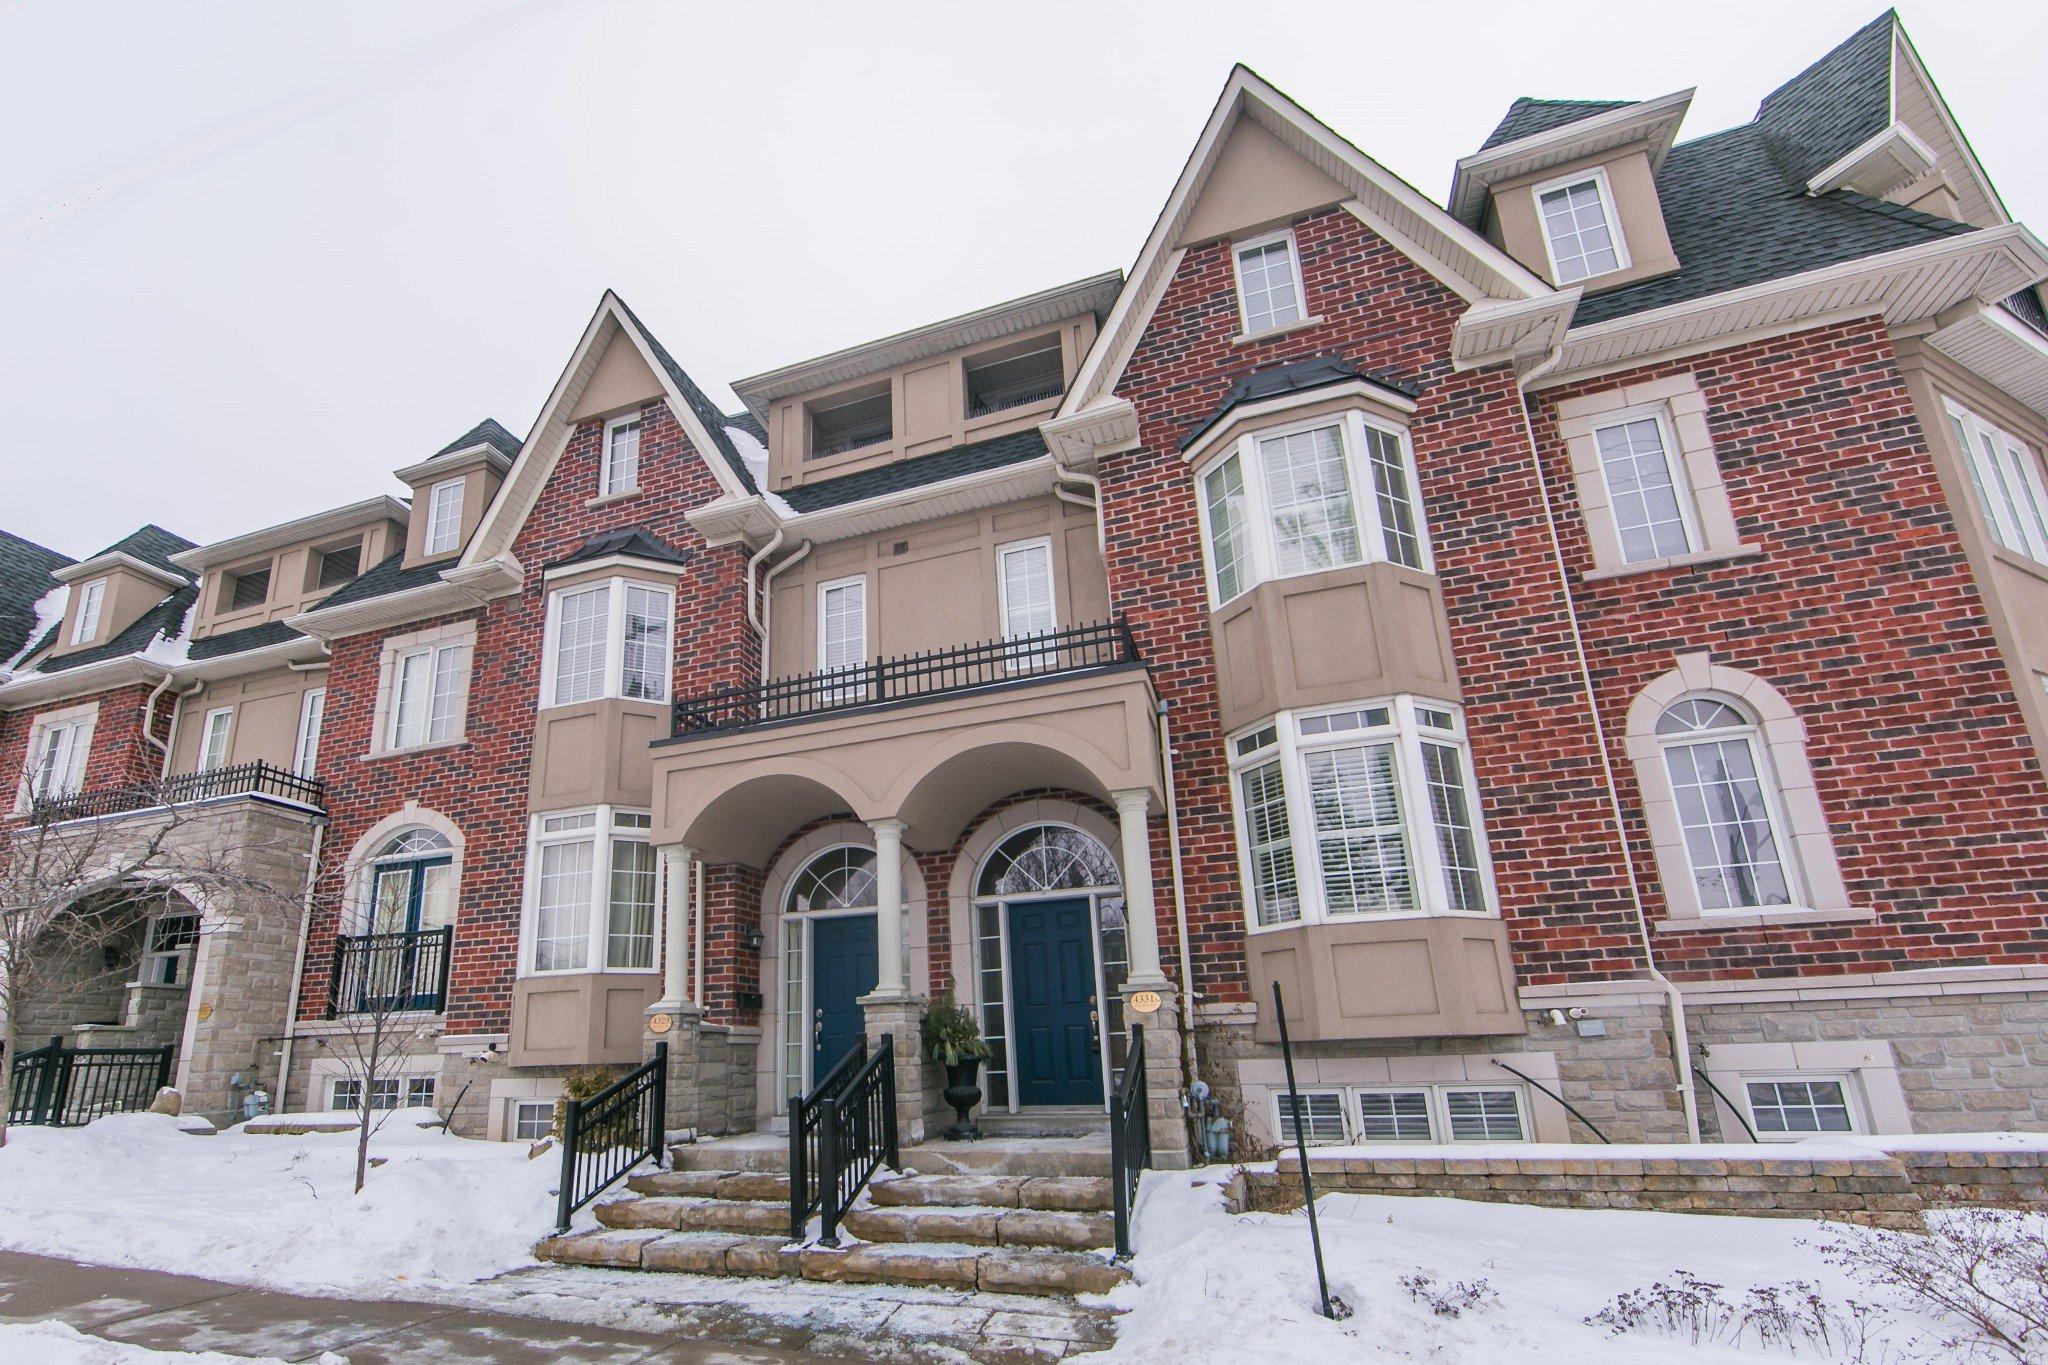 Main Photo: 4331A W Bloor Street in Toronto: Markland Wood Condo for sale (Toronto W08)  : MLS®# W4364411